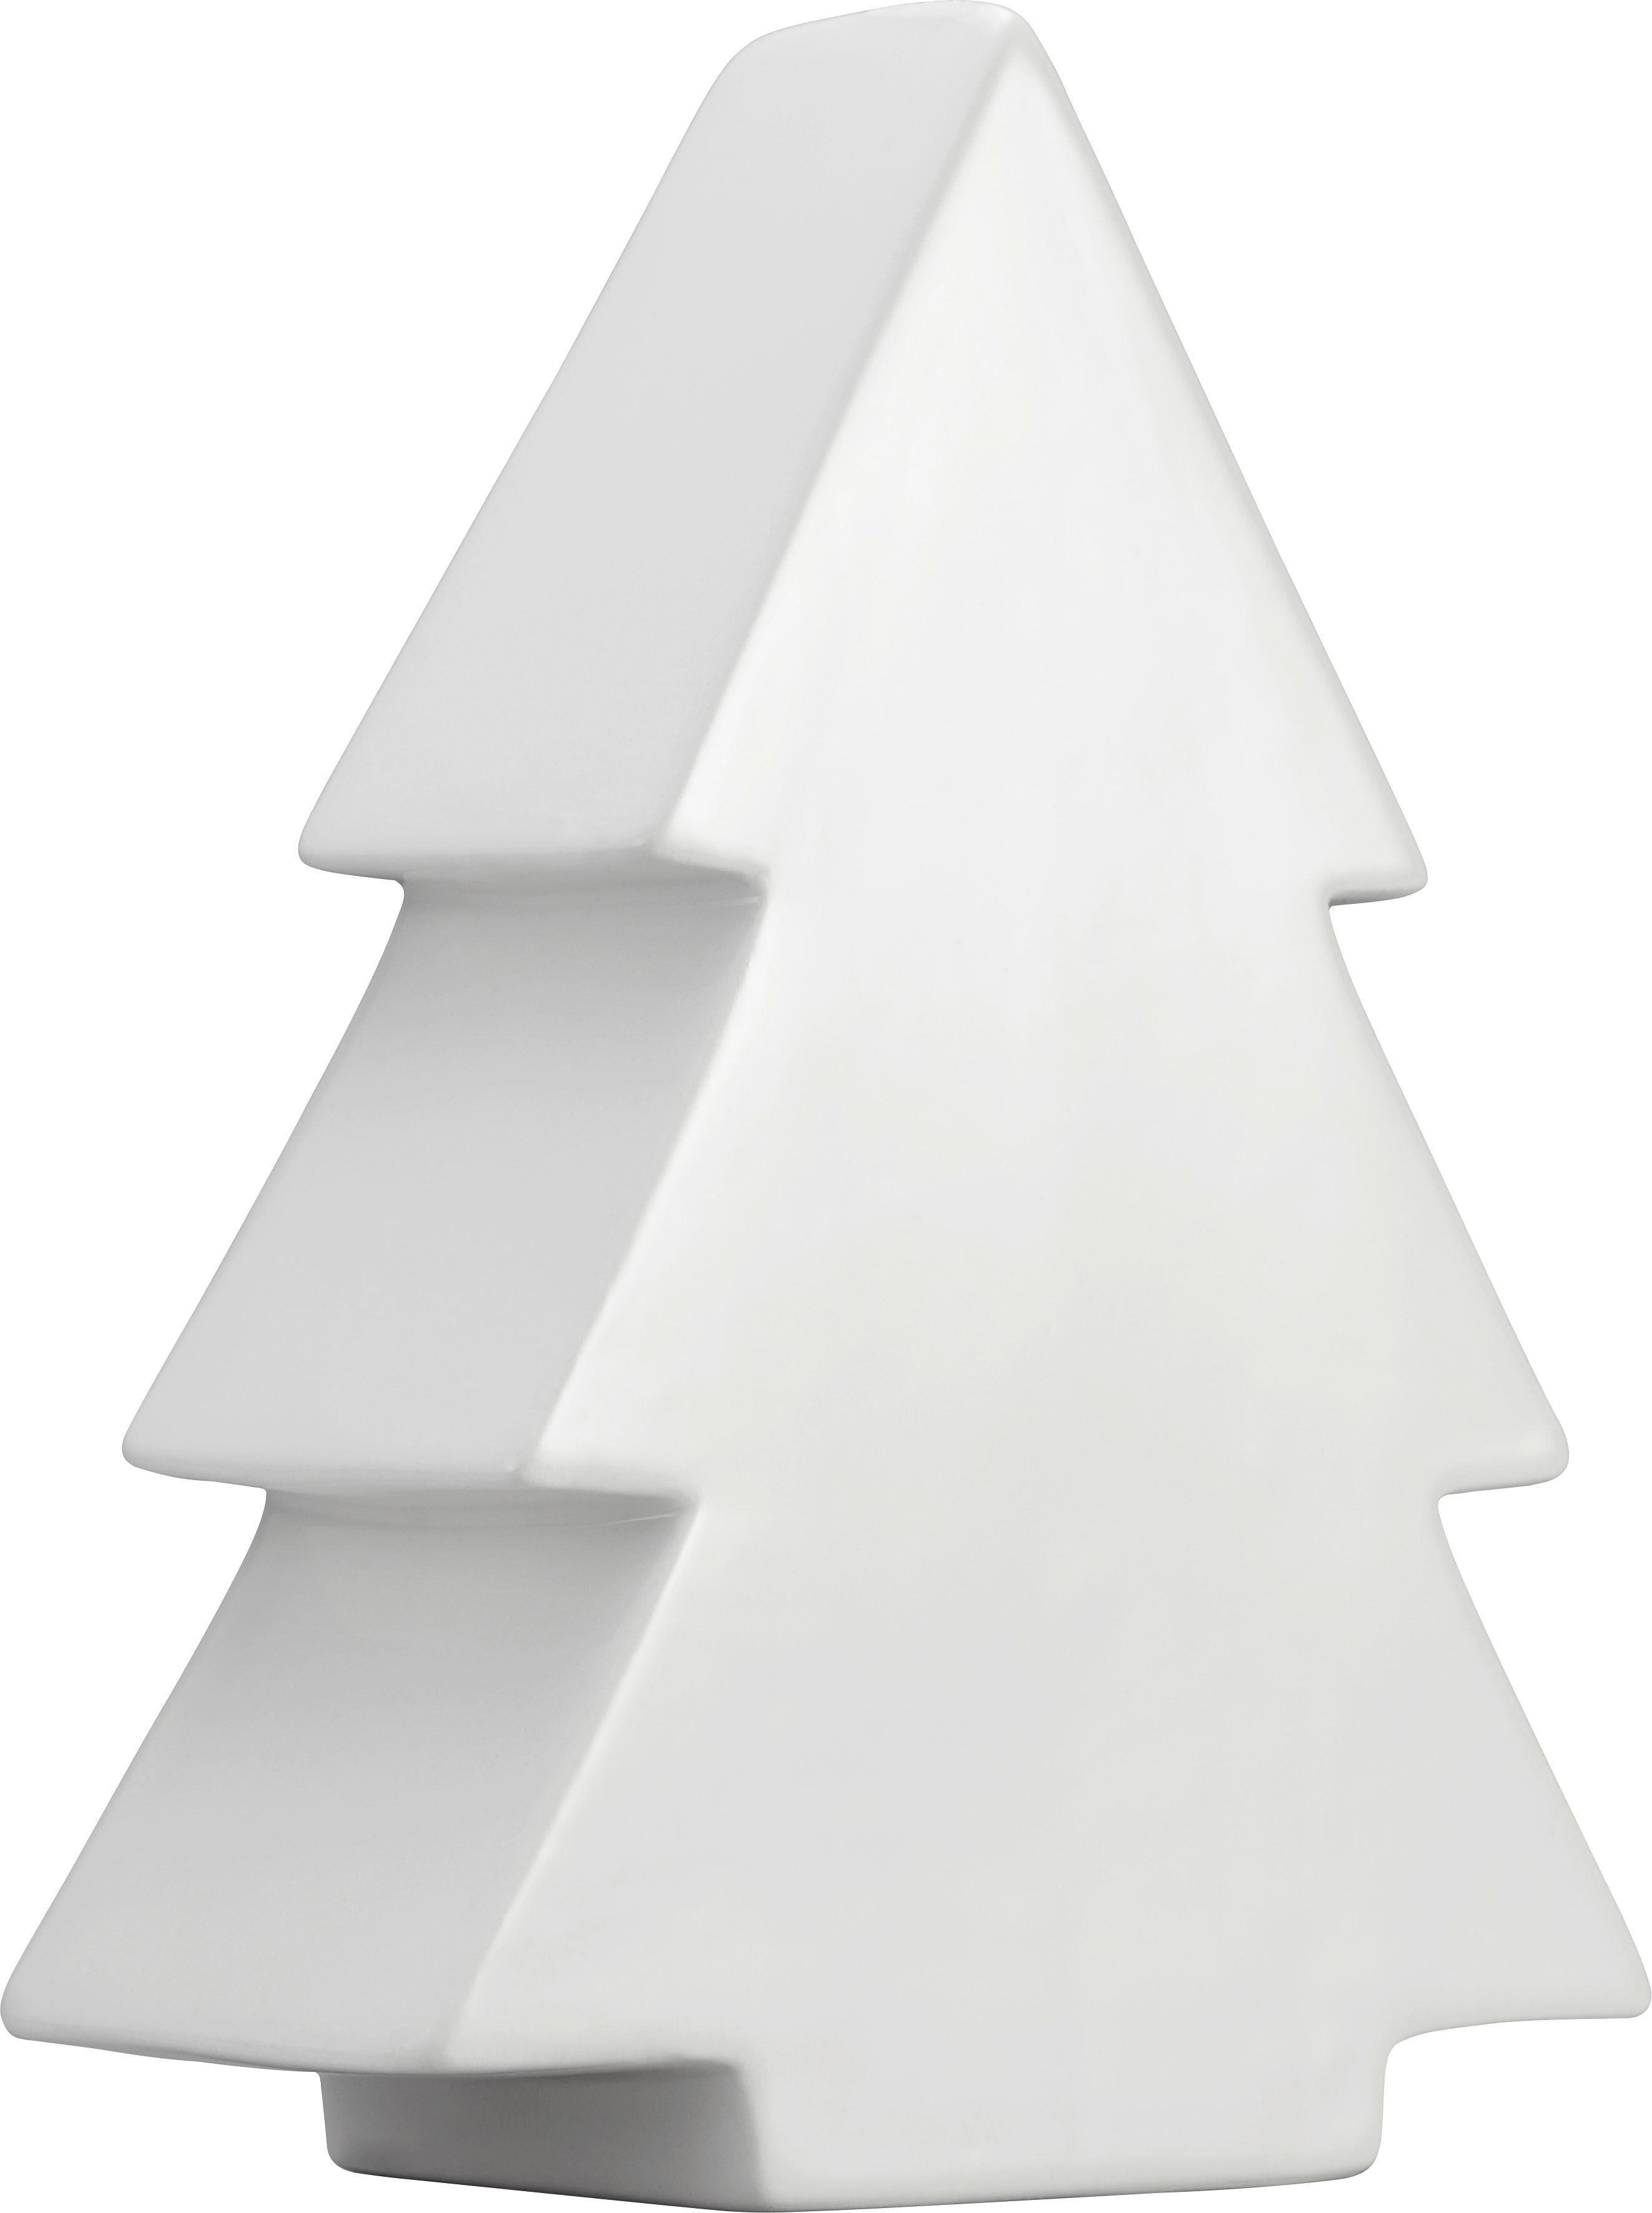 Dekor Fa Luise - fehér, kerámia (20cm) - MÖMAX modern living